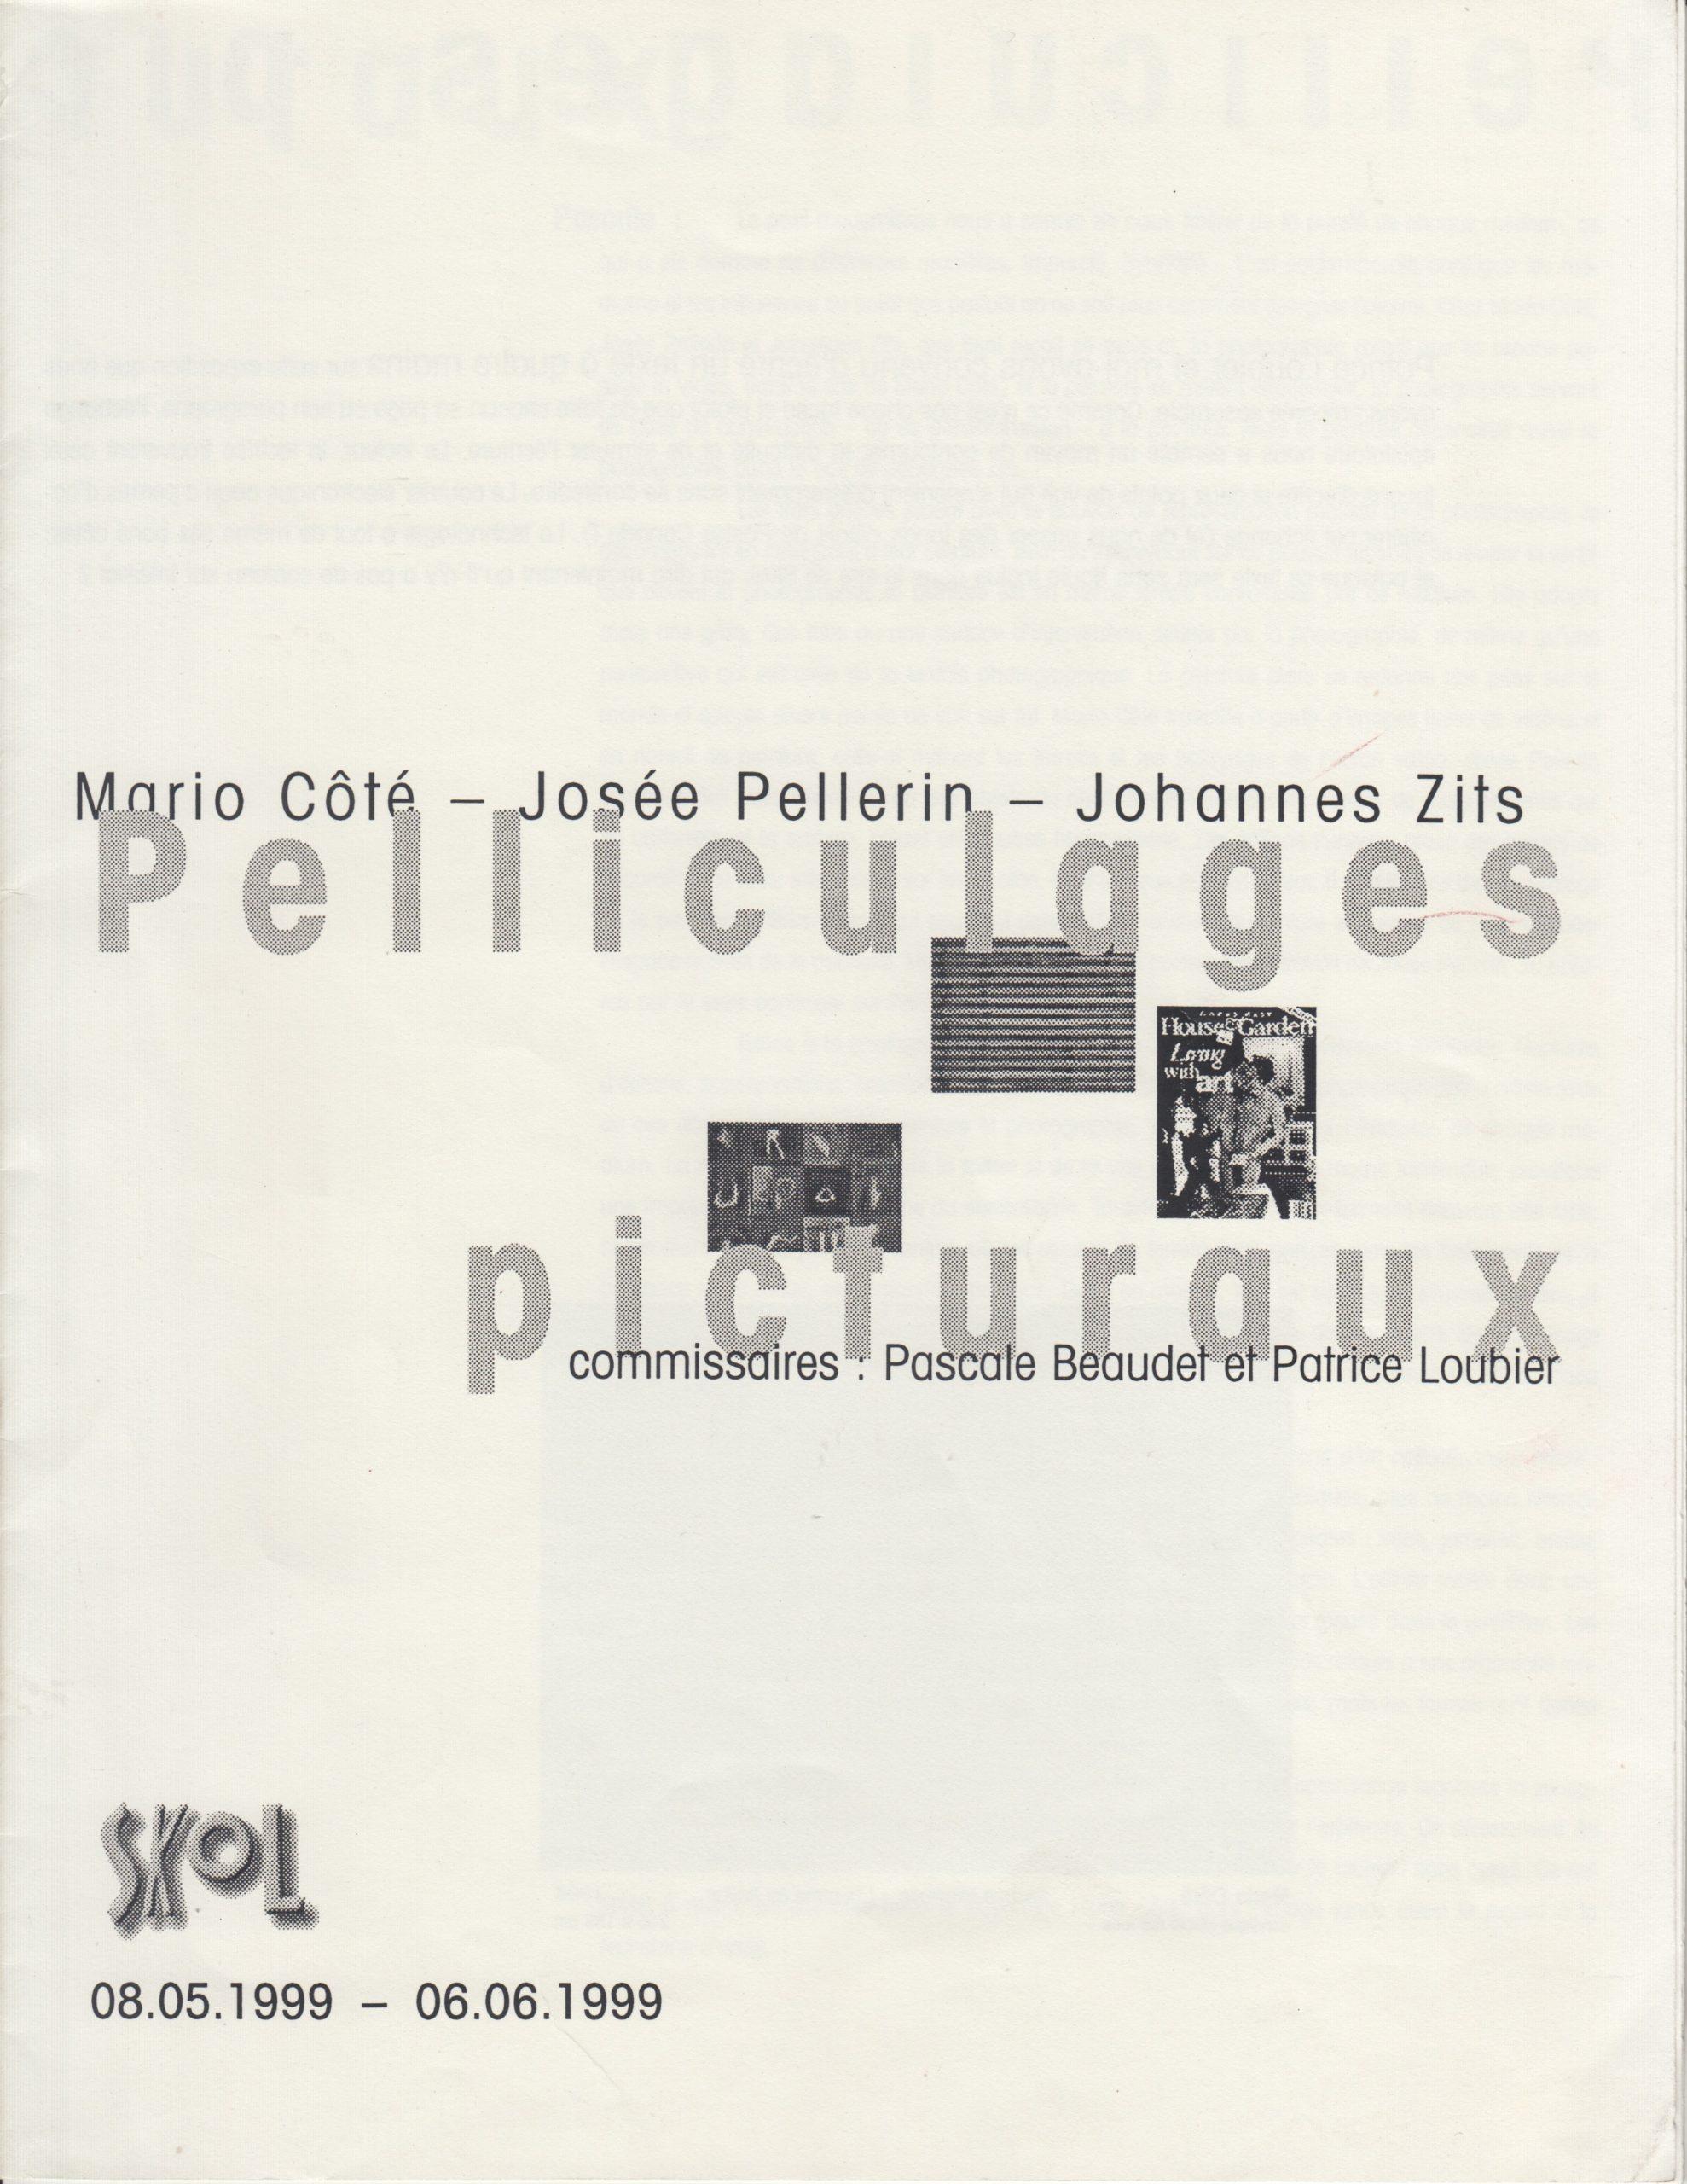 Pelliculages picturaux, Pascale Beaudet, Patrice Loubier, 1999